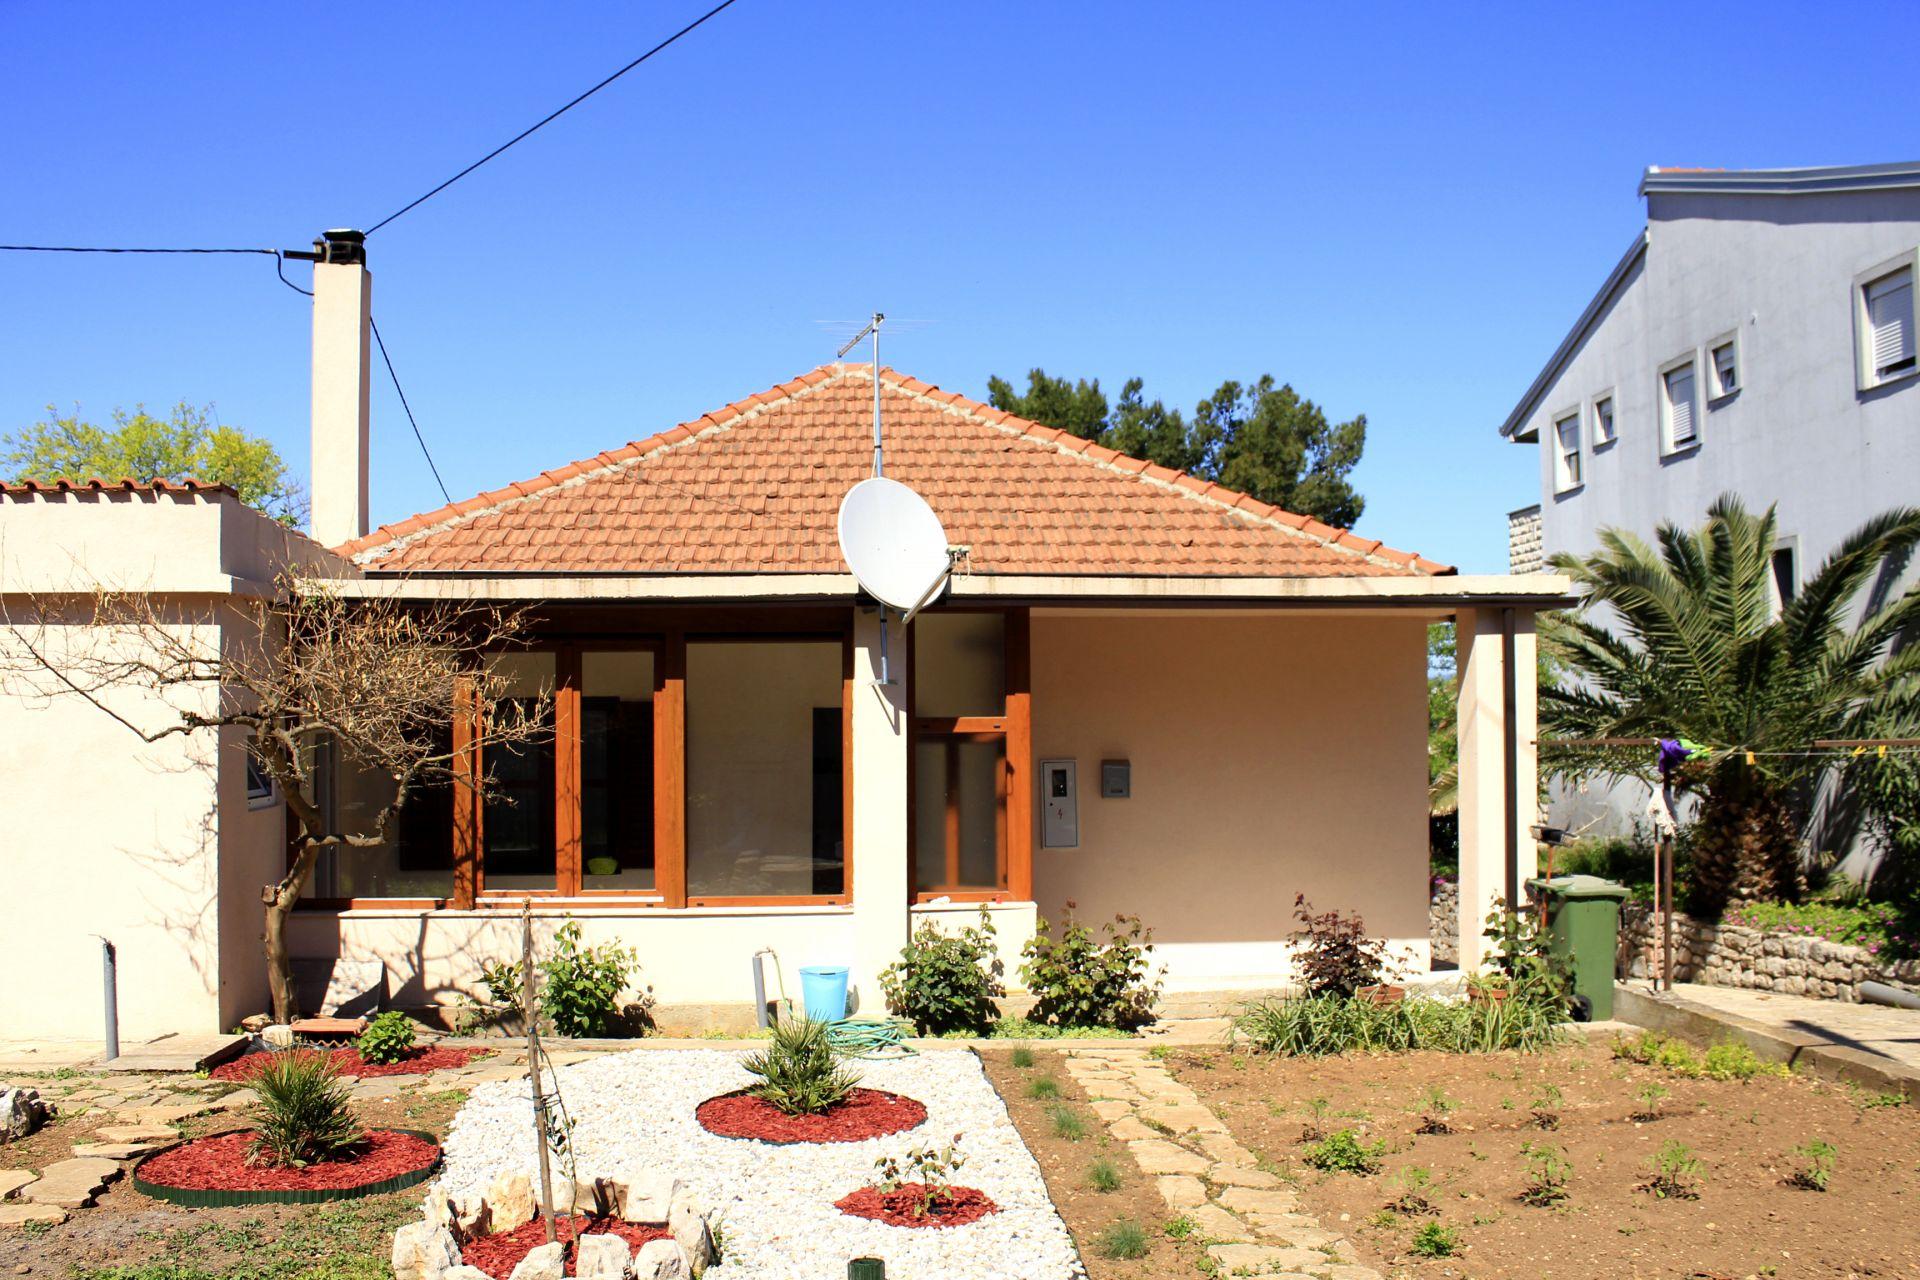 Krajka - Tkon - Vakantiehuizen, villa´s Kroatië